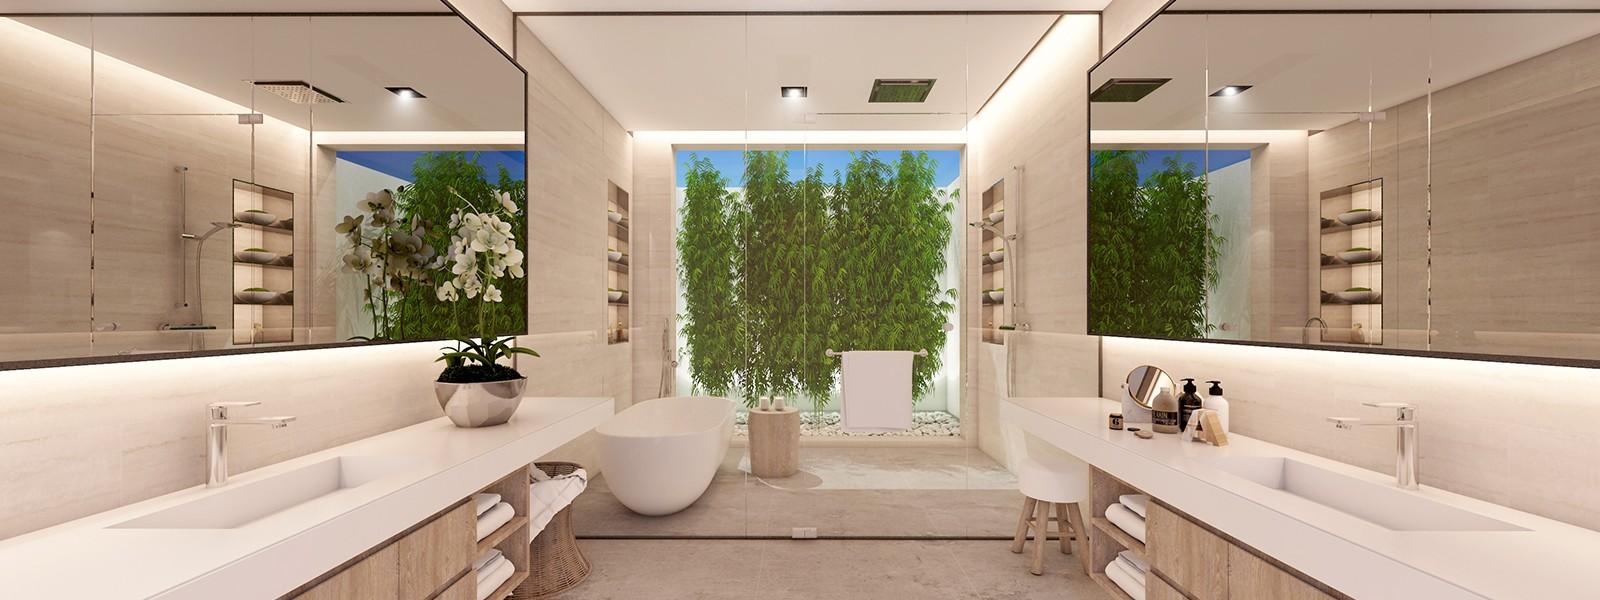 Sneha Divias Atelier - Dubai Hills Villa